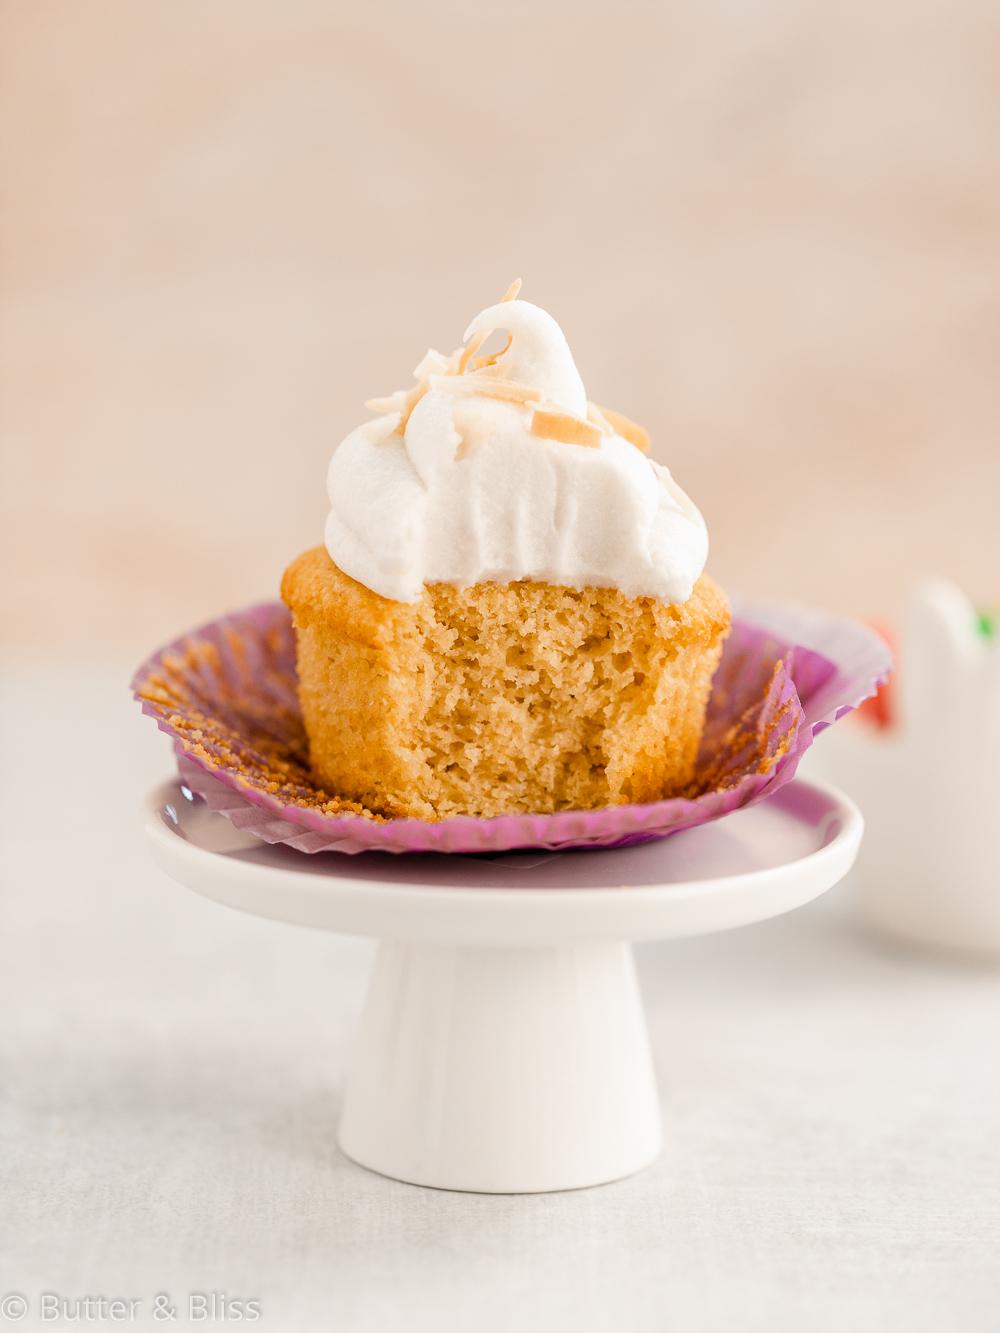 Gluten free vanilla cupcake with a bite